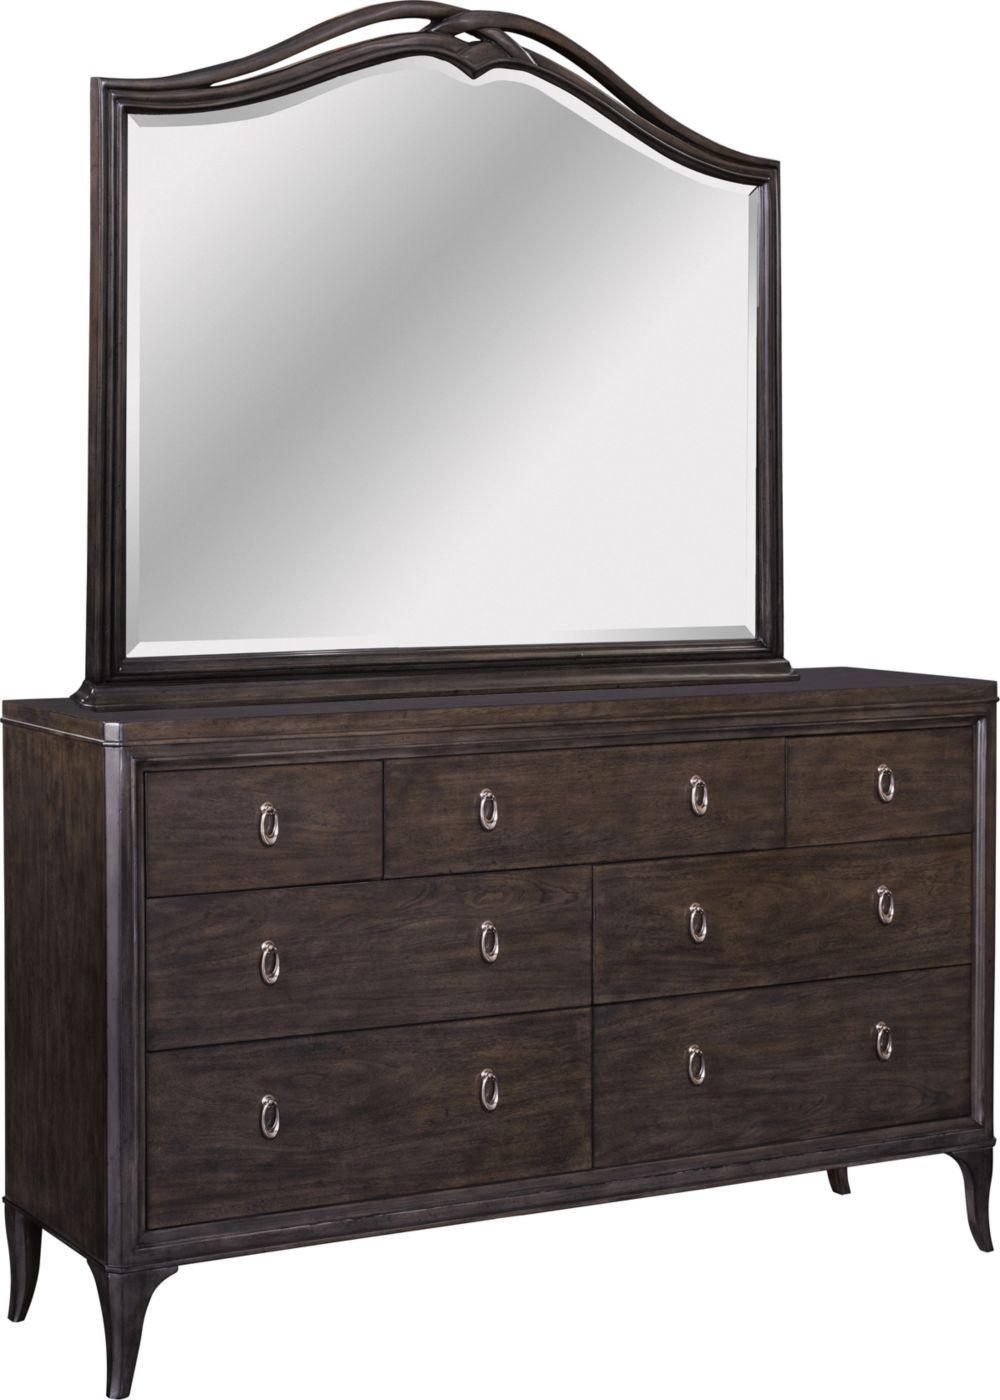 Big Lots Bedroom Furniture Dressers : bedroom, furniture, dressers, Cashmera, Drawer, Dresser, Broyhill's, Elegant, Canted, Cabriole, Legs,, Return, Moldings,…, Broyhill, Furniture,, Broyhill,, Drawers